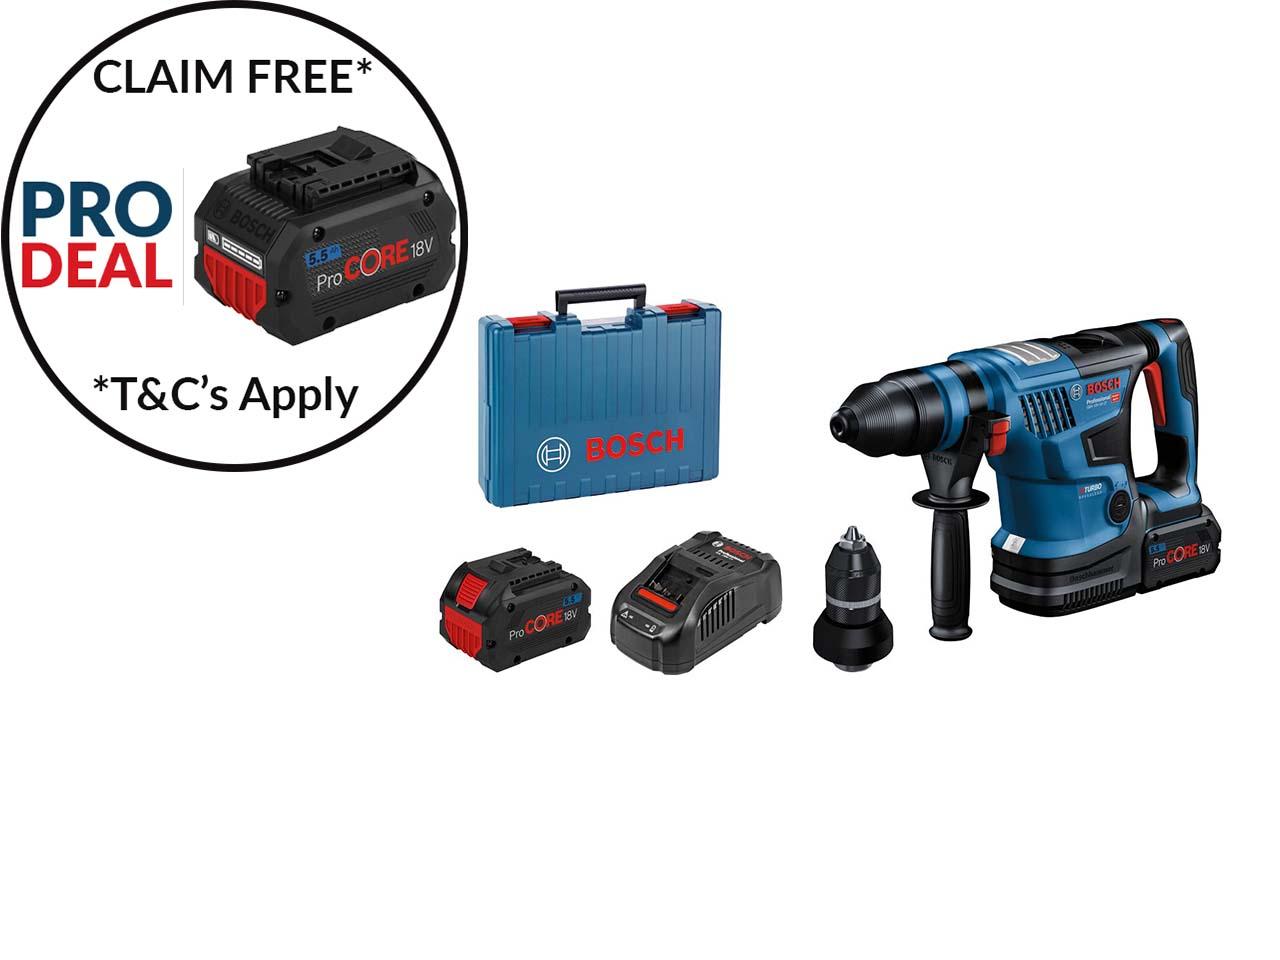 Bosch_GBH18V34PC5_A.jpg